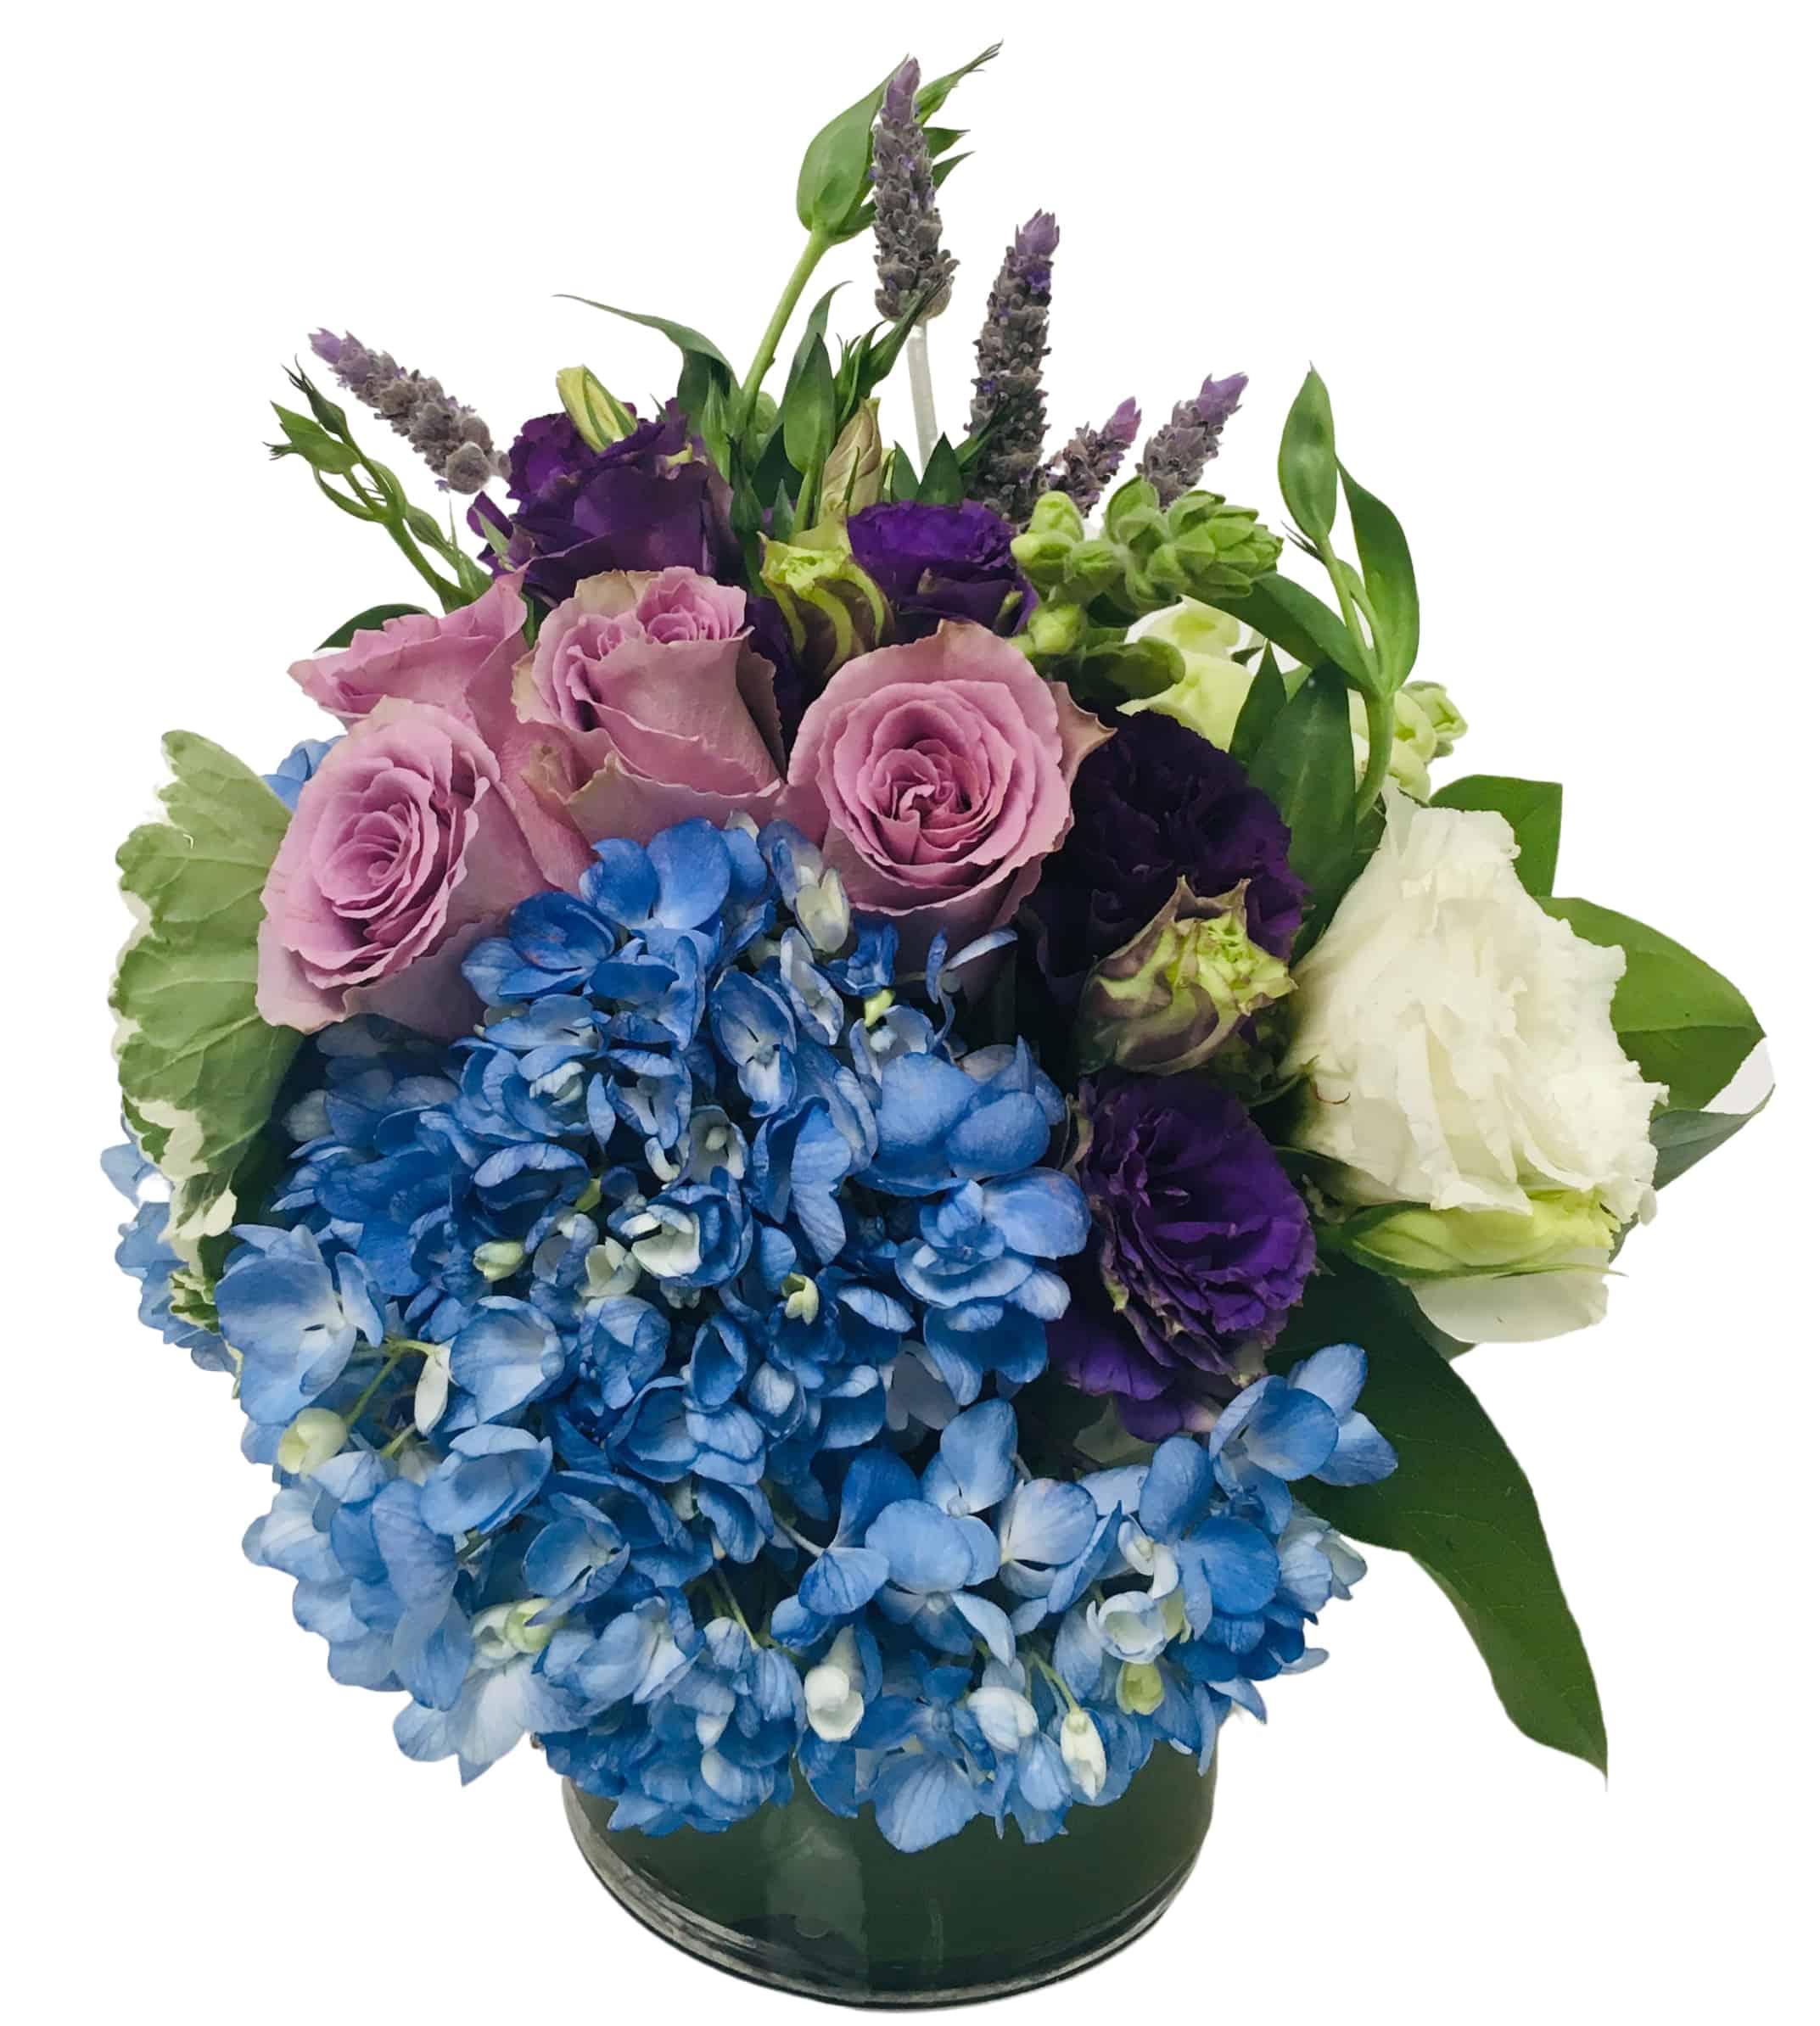 Azzurro Toscano Medley Flower Arrangement